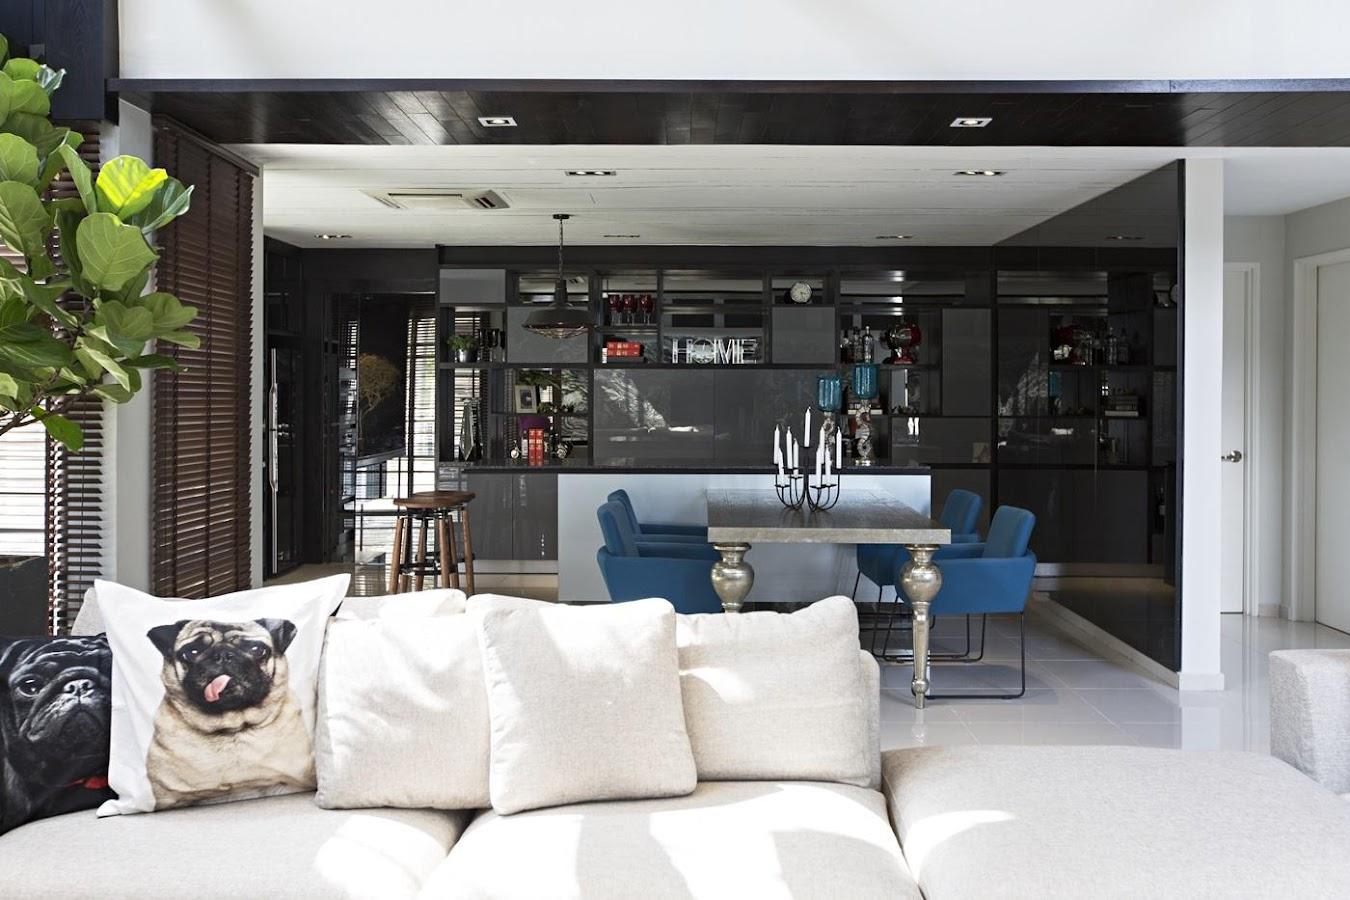 House design terrace - Terrace House Design Screenshot